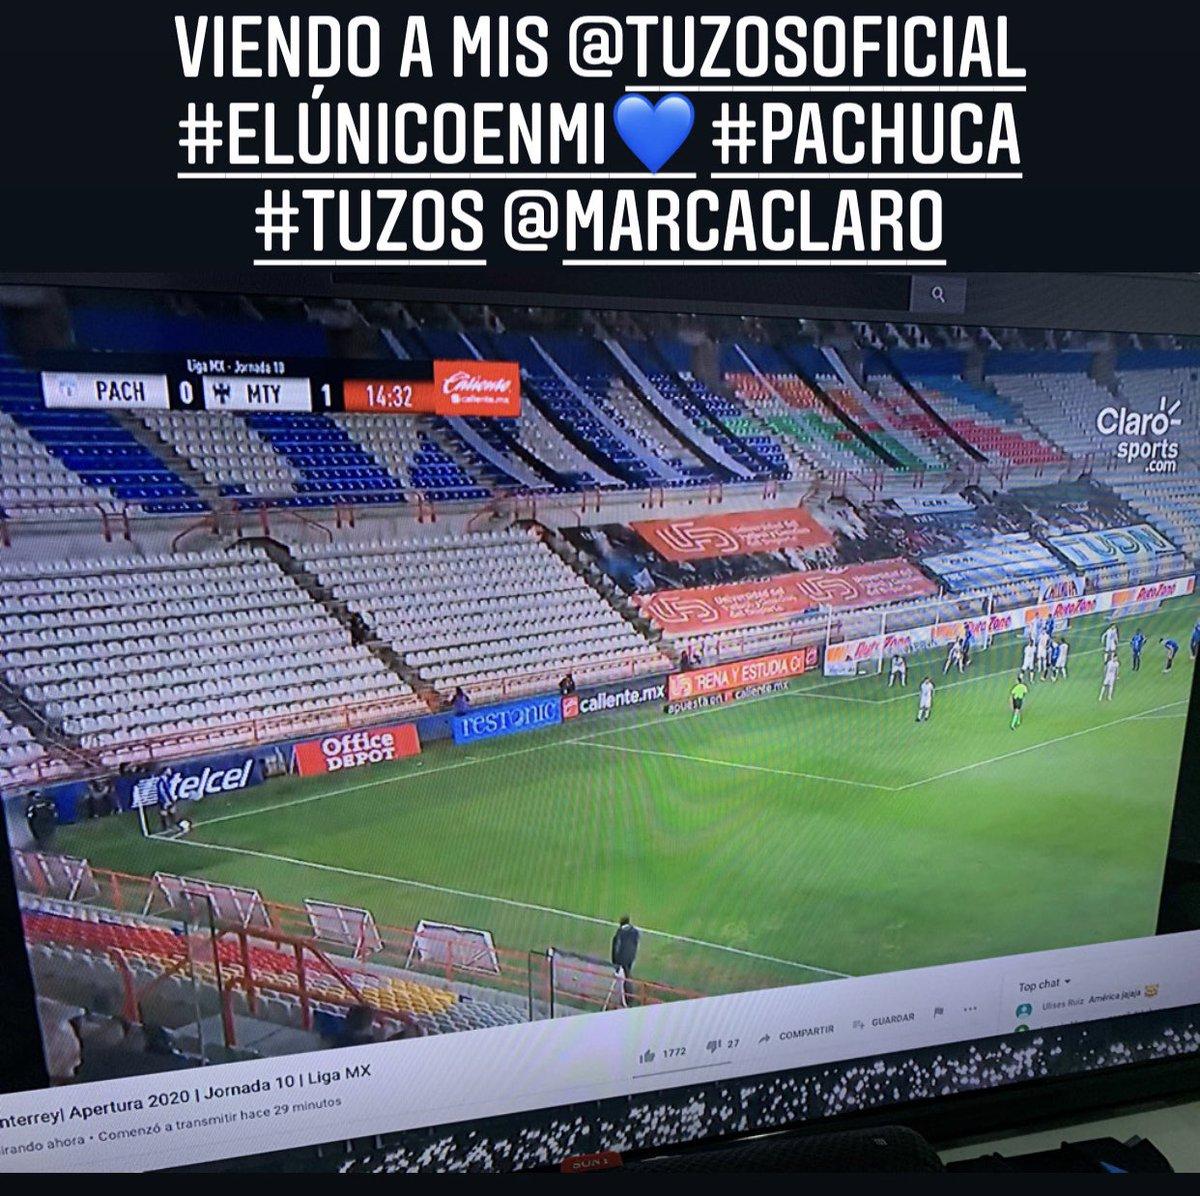 VIENDO A MIS @TUZOSOFICIAL  #ELÚNICOENMI💙 #PACHUCA #TUZOS @MARCACLARO @Tuzos @MarcaClaro #ElUnicoEnMi💙 #Pachuca https://t.co/IxSNvbxv1h